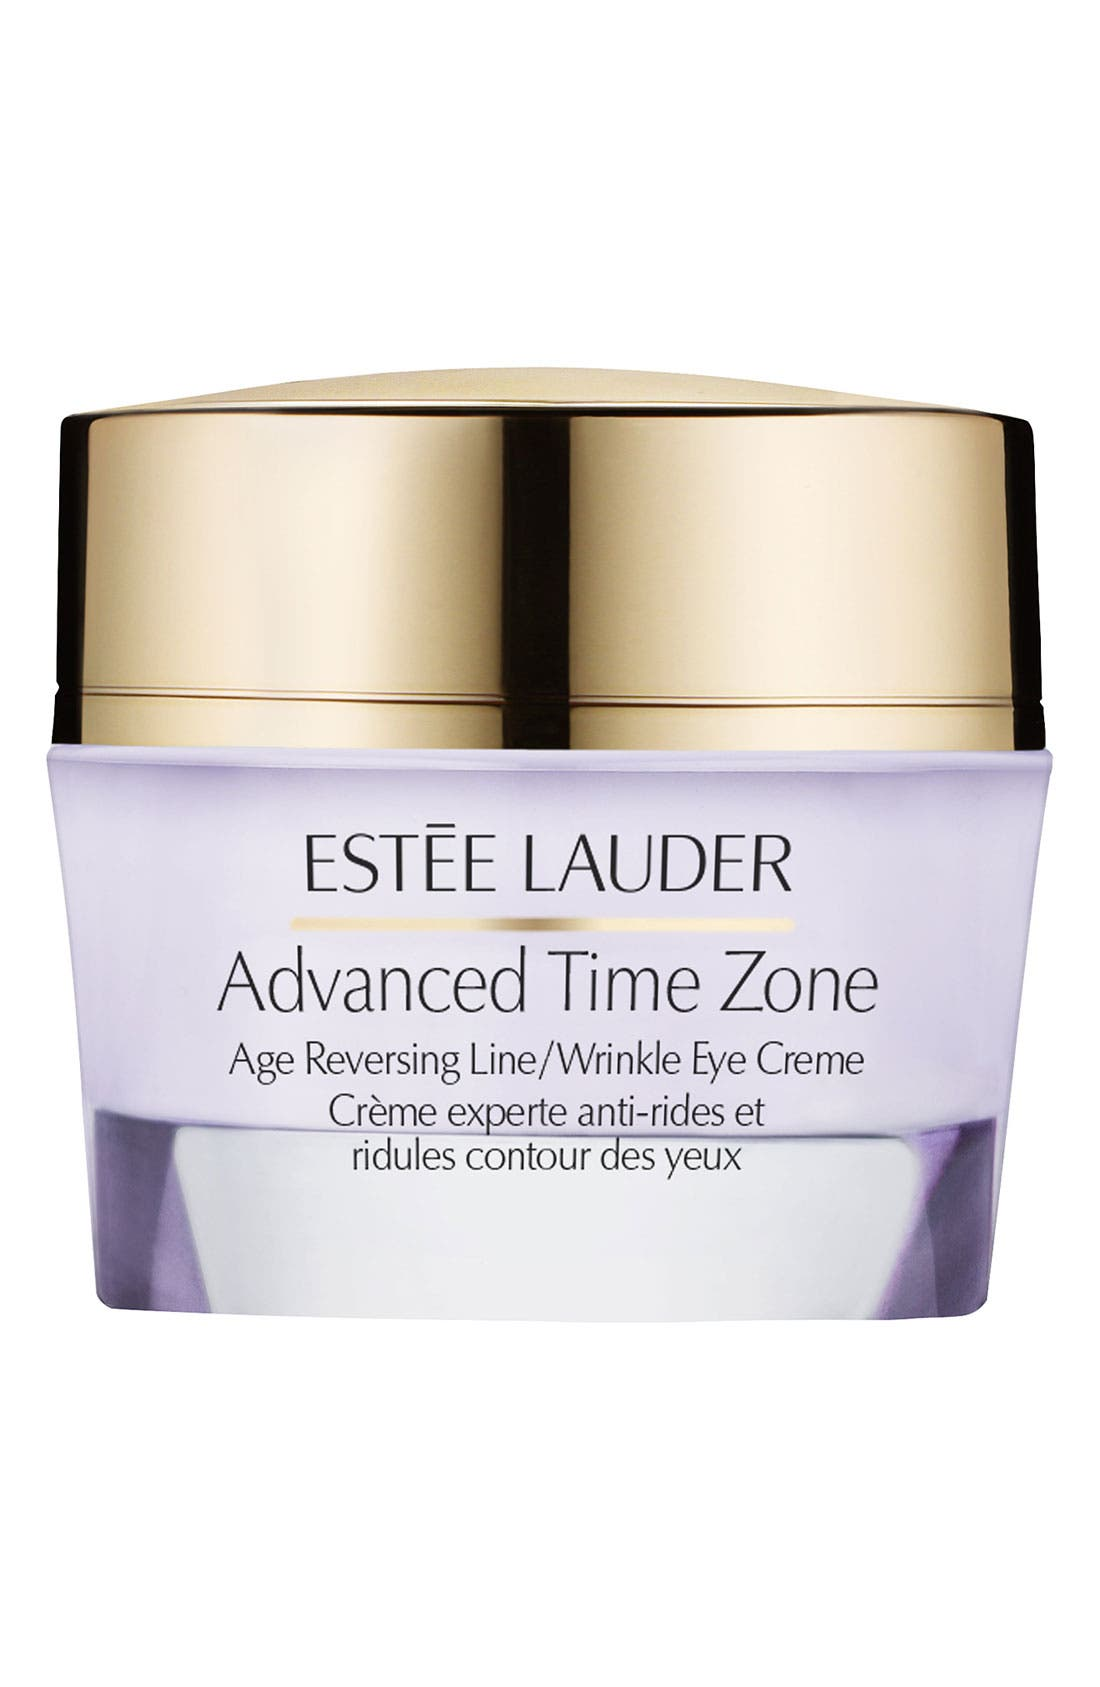 Advanced Time Zone Age Reversing Line/Wrinkle Eye Creme,                             Main thumbnail 1, color,                             000